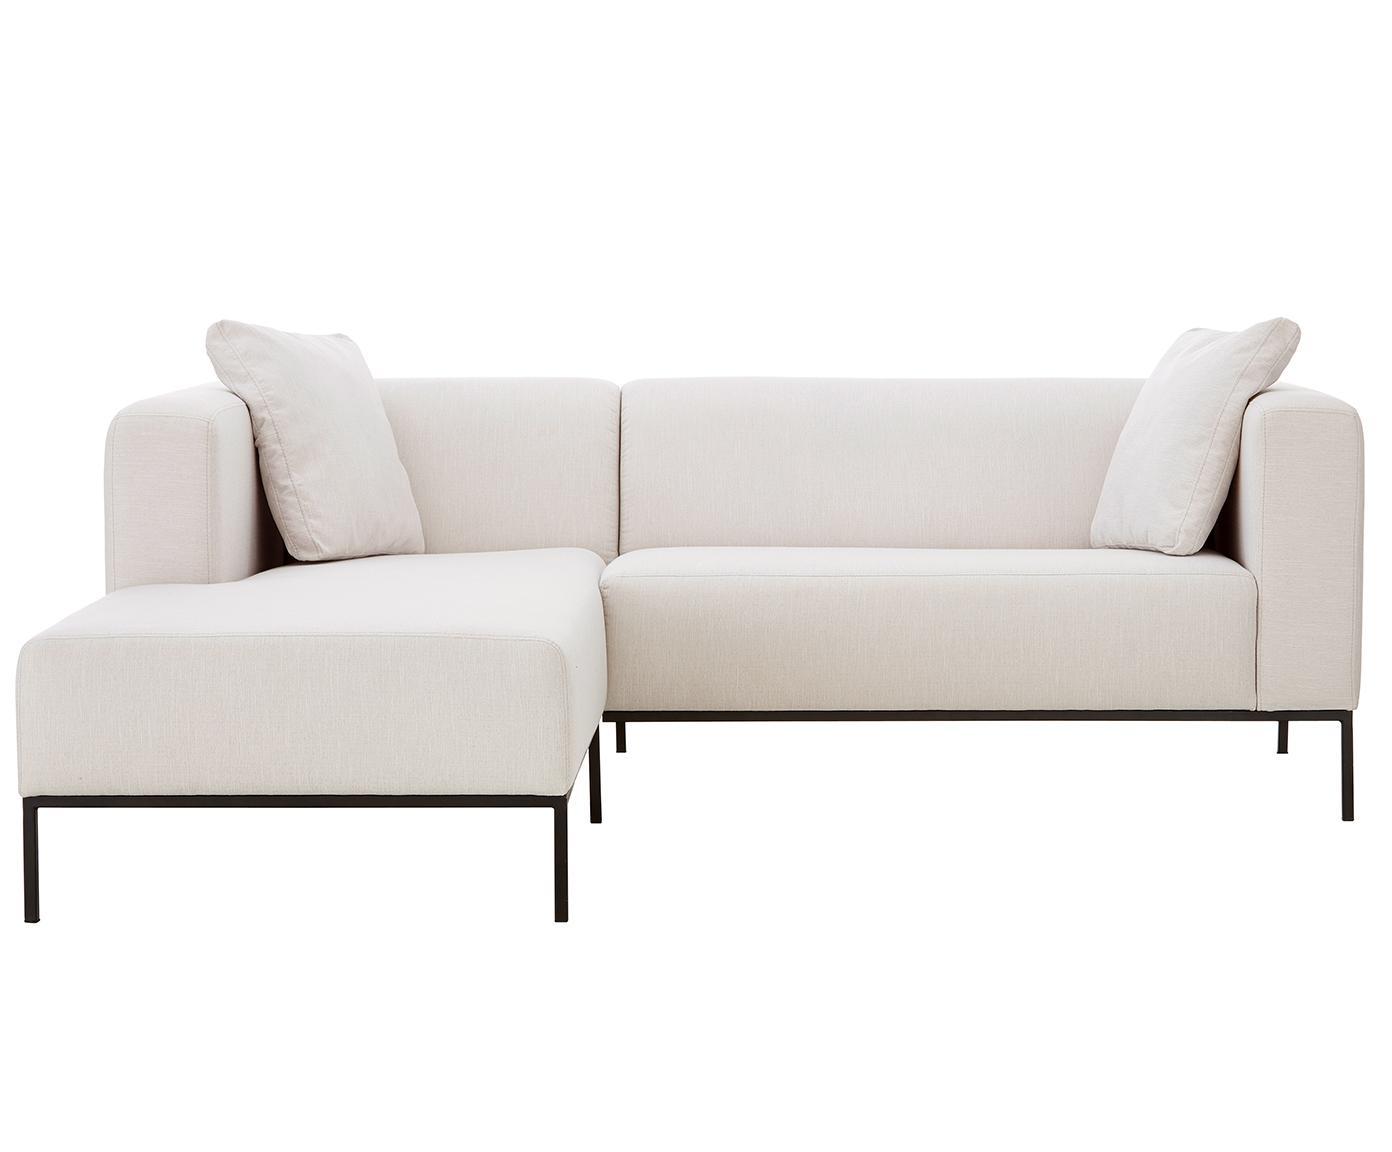 Ecksofa Carrie, Bezug: Polyester 50.000 Scheuert, Gestell: Spanholz, Hartfaserplatte, Webstoff Beige, B 241 x T 200 cm